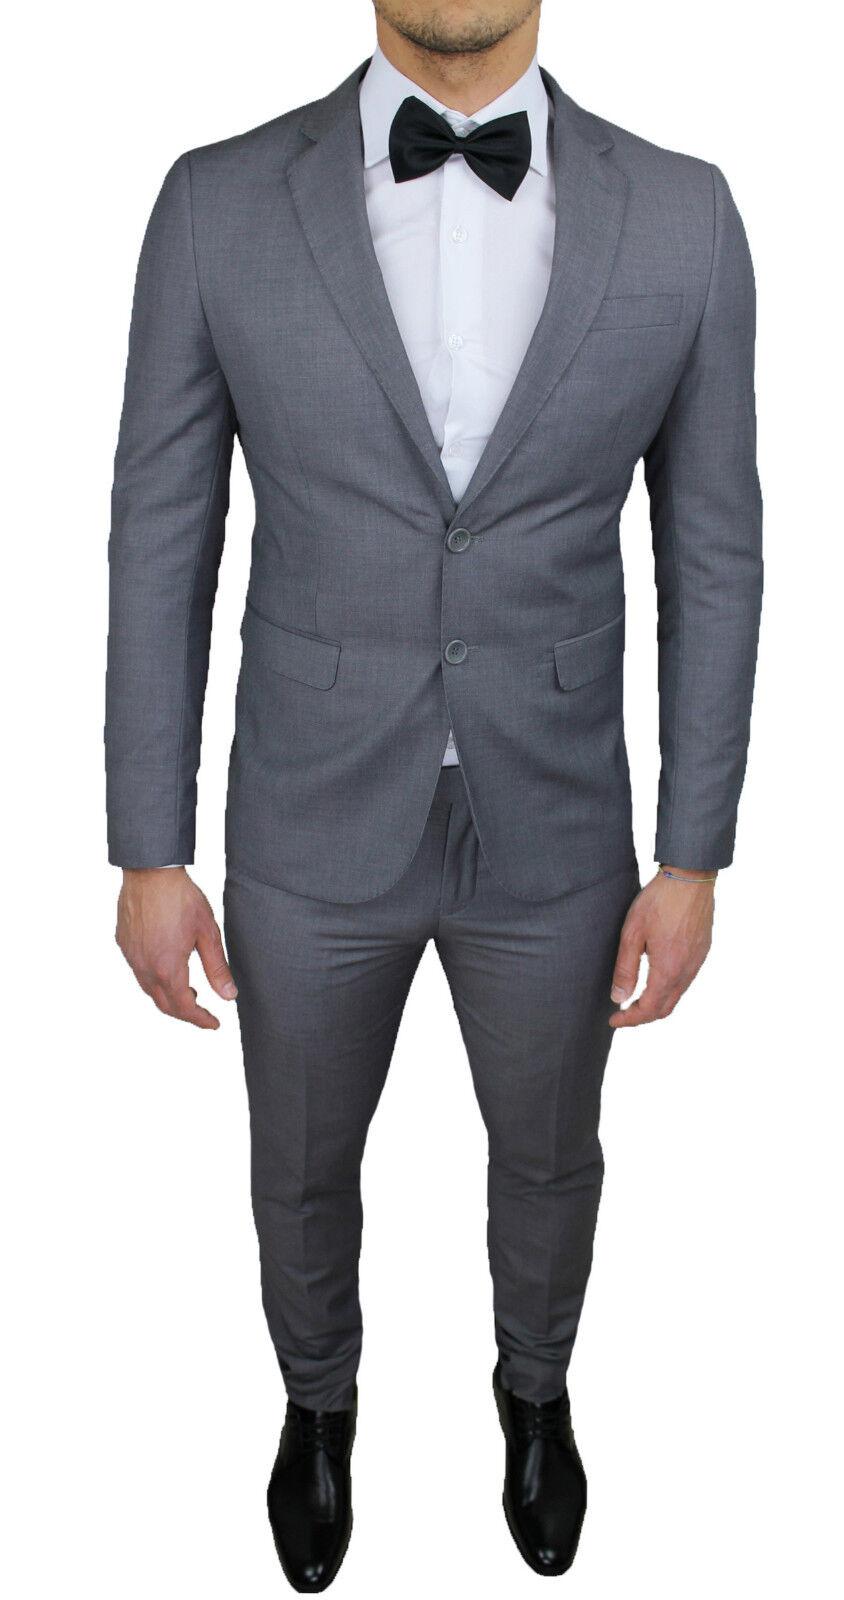 Men's Suit Diamond Sartoriale Grey New Tight Slim Fit Formal Elegant